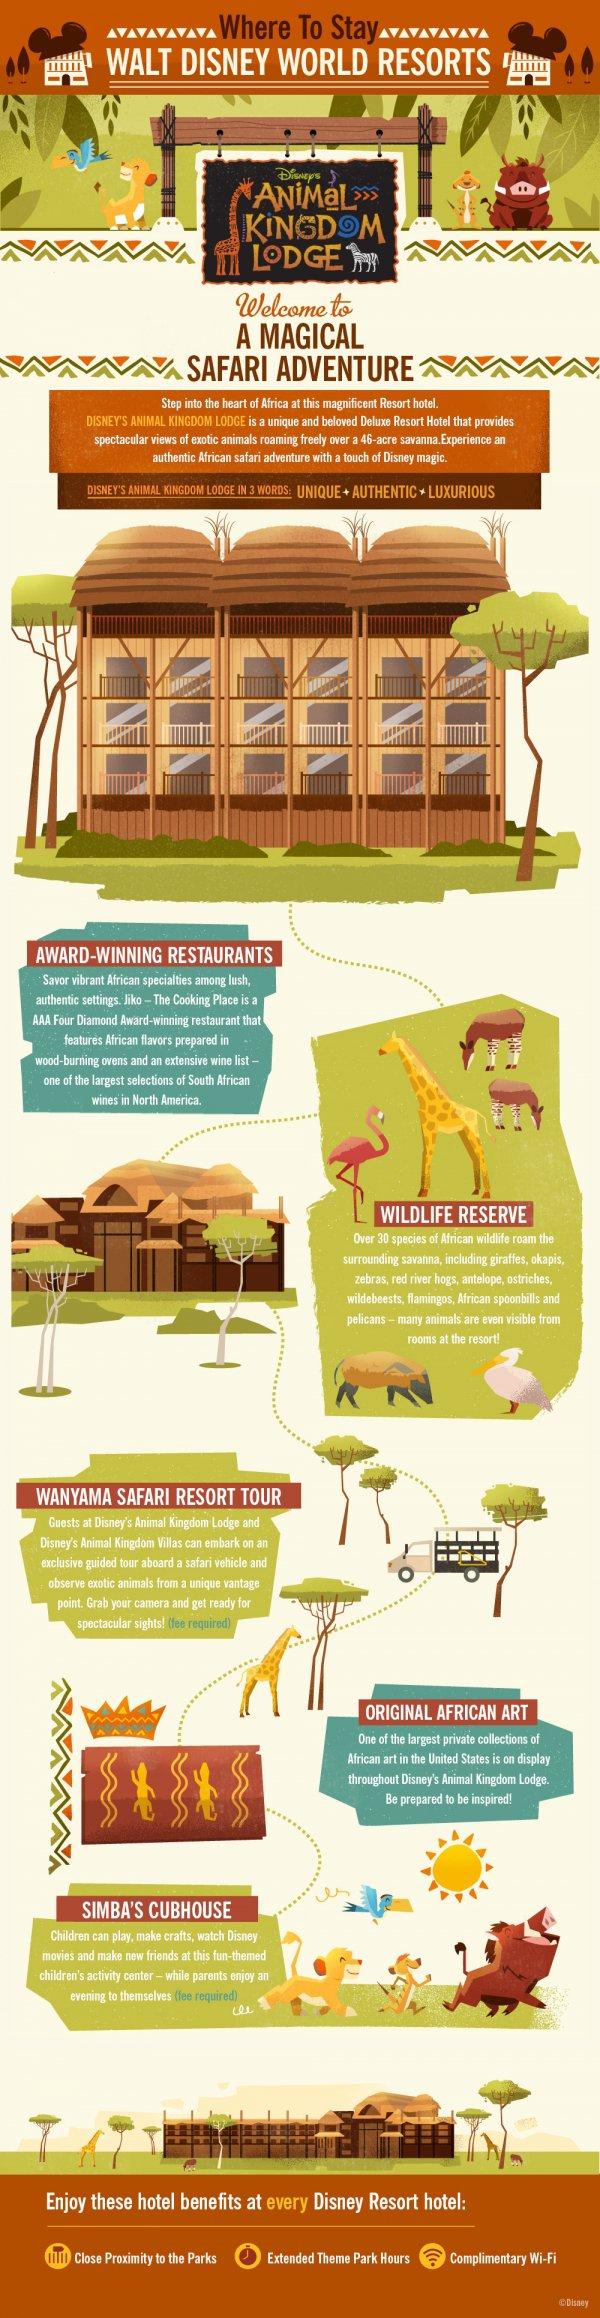 Disney's Animal Kingdom Lodge I